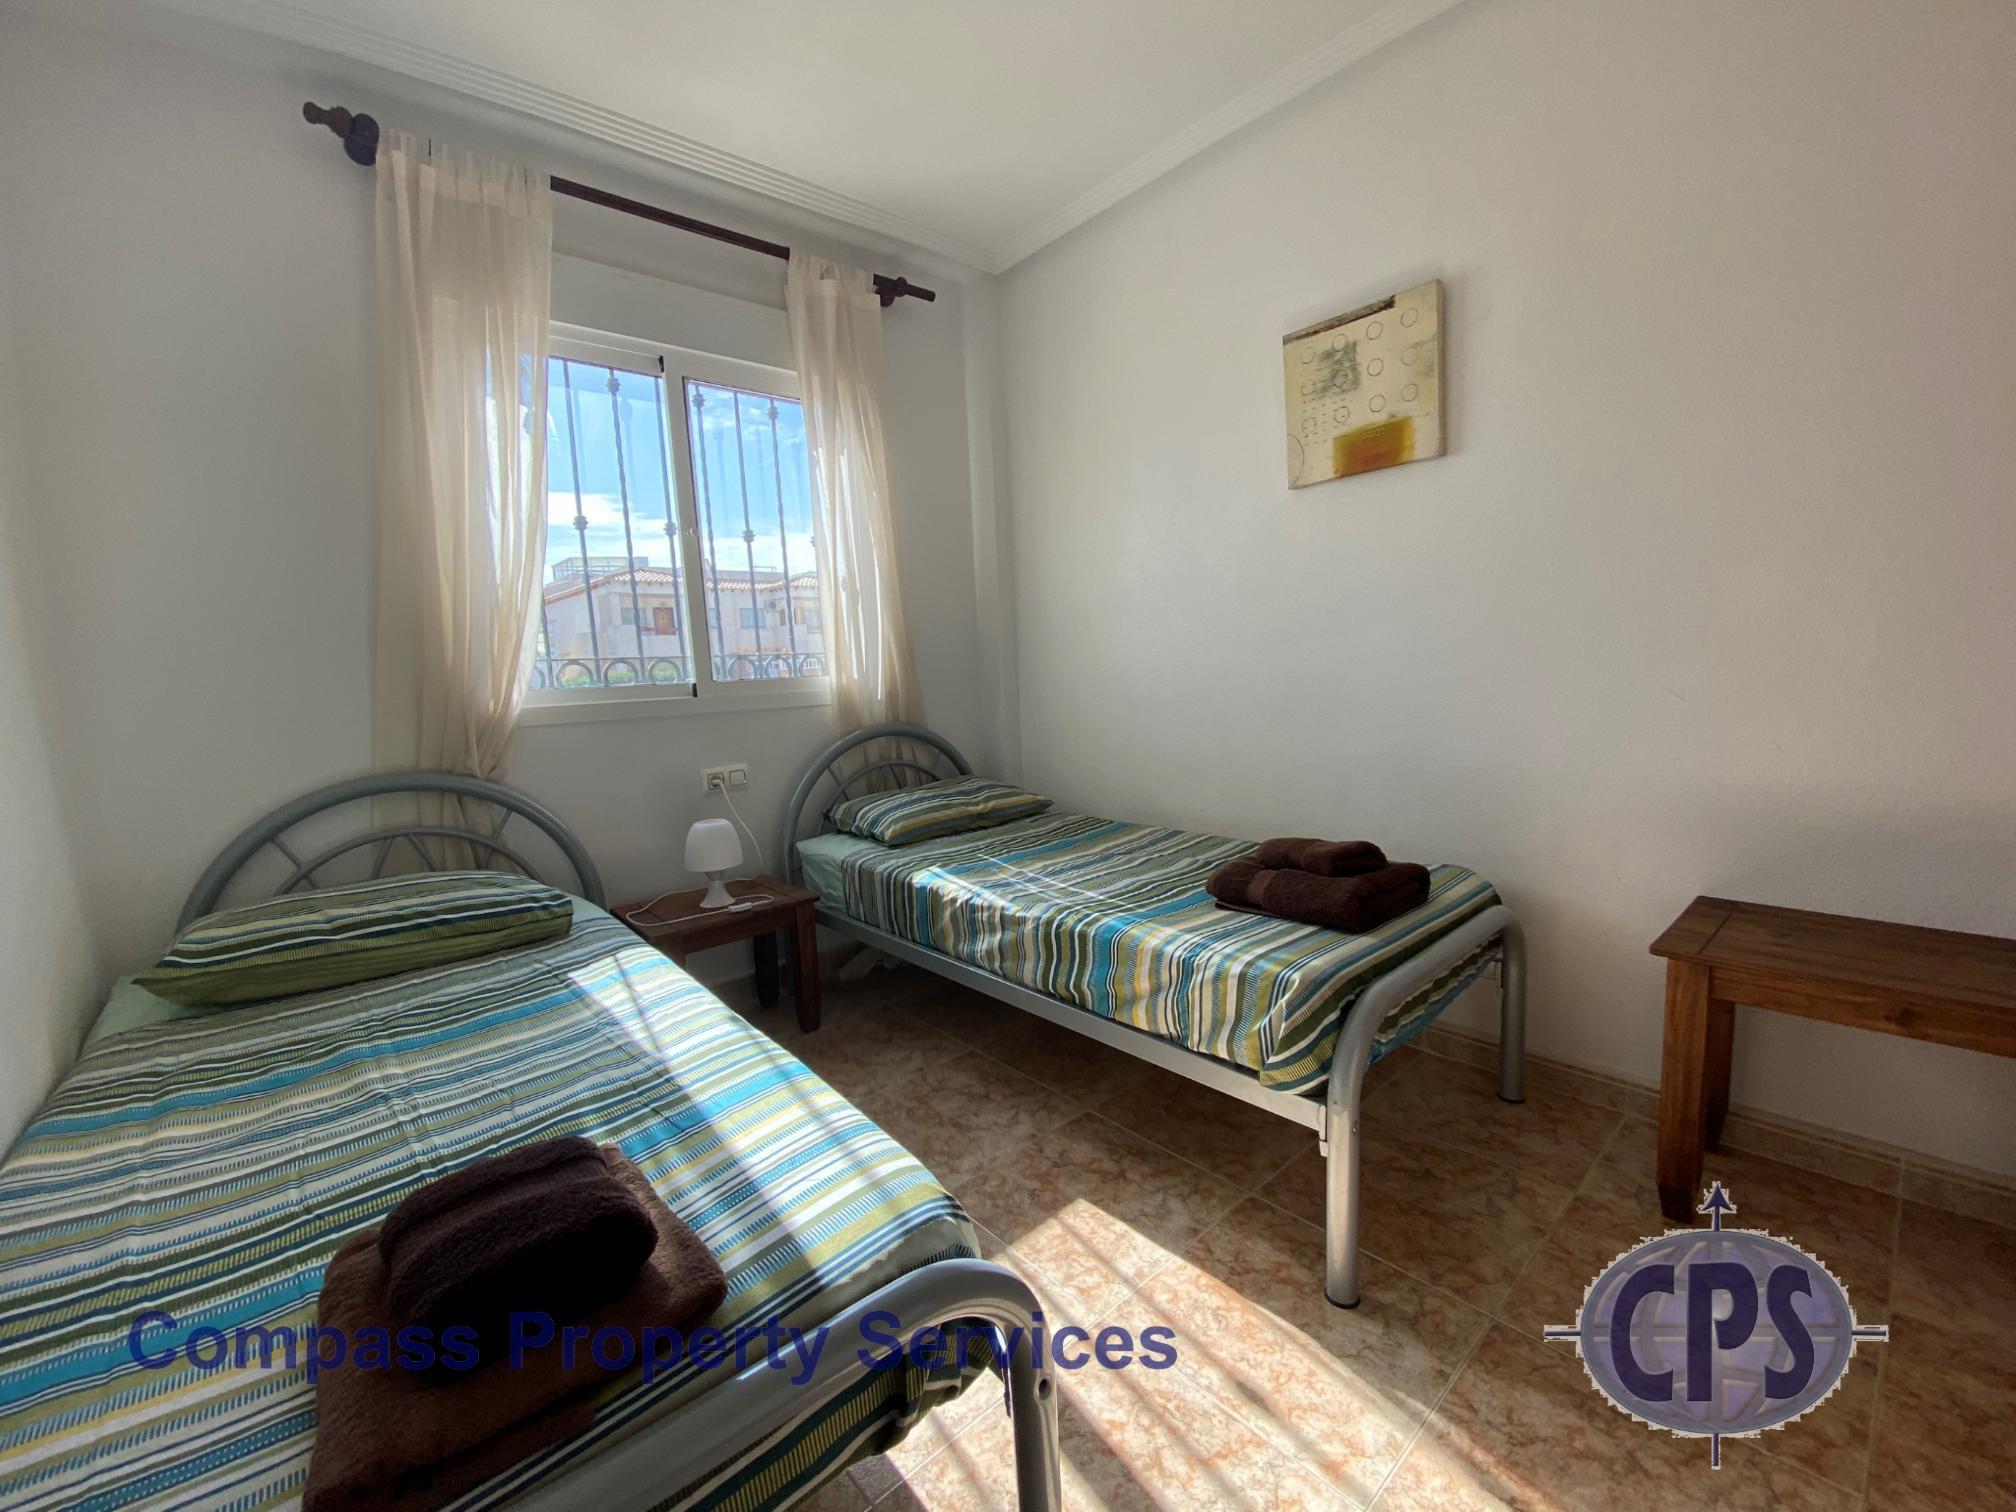 Apartment La Cinuelica R3 1st flr apt overlooking pool l149 photo 28556780